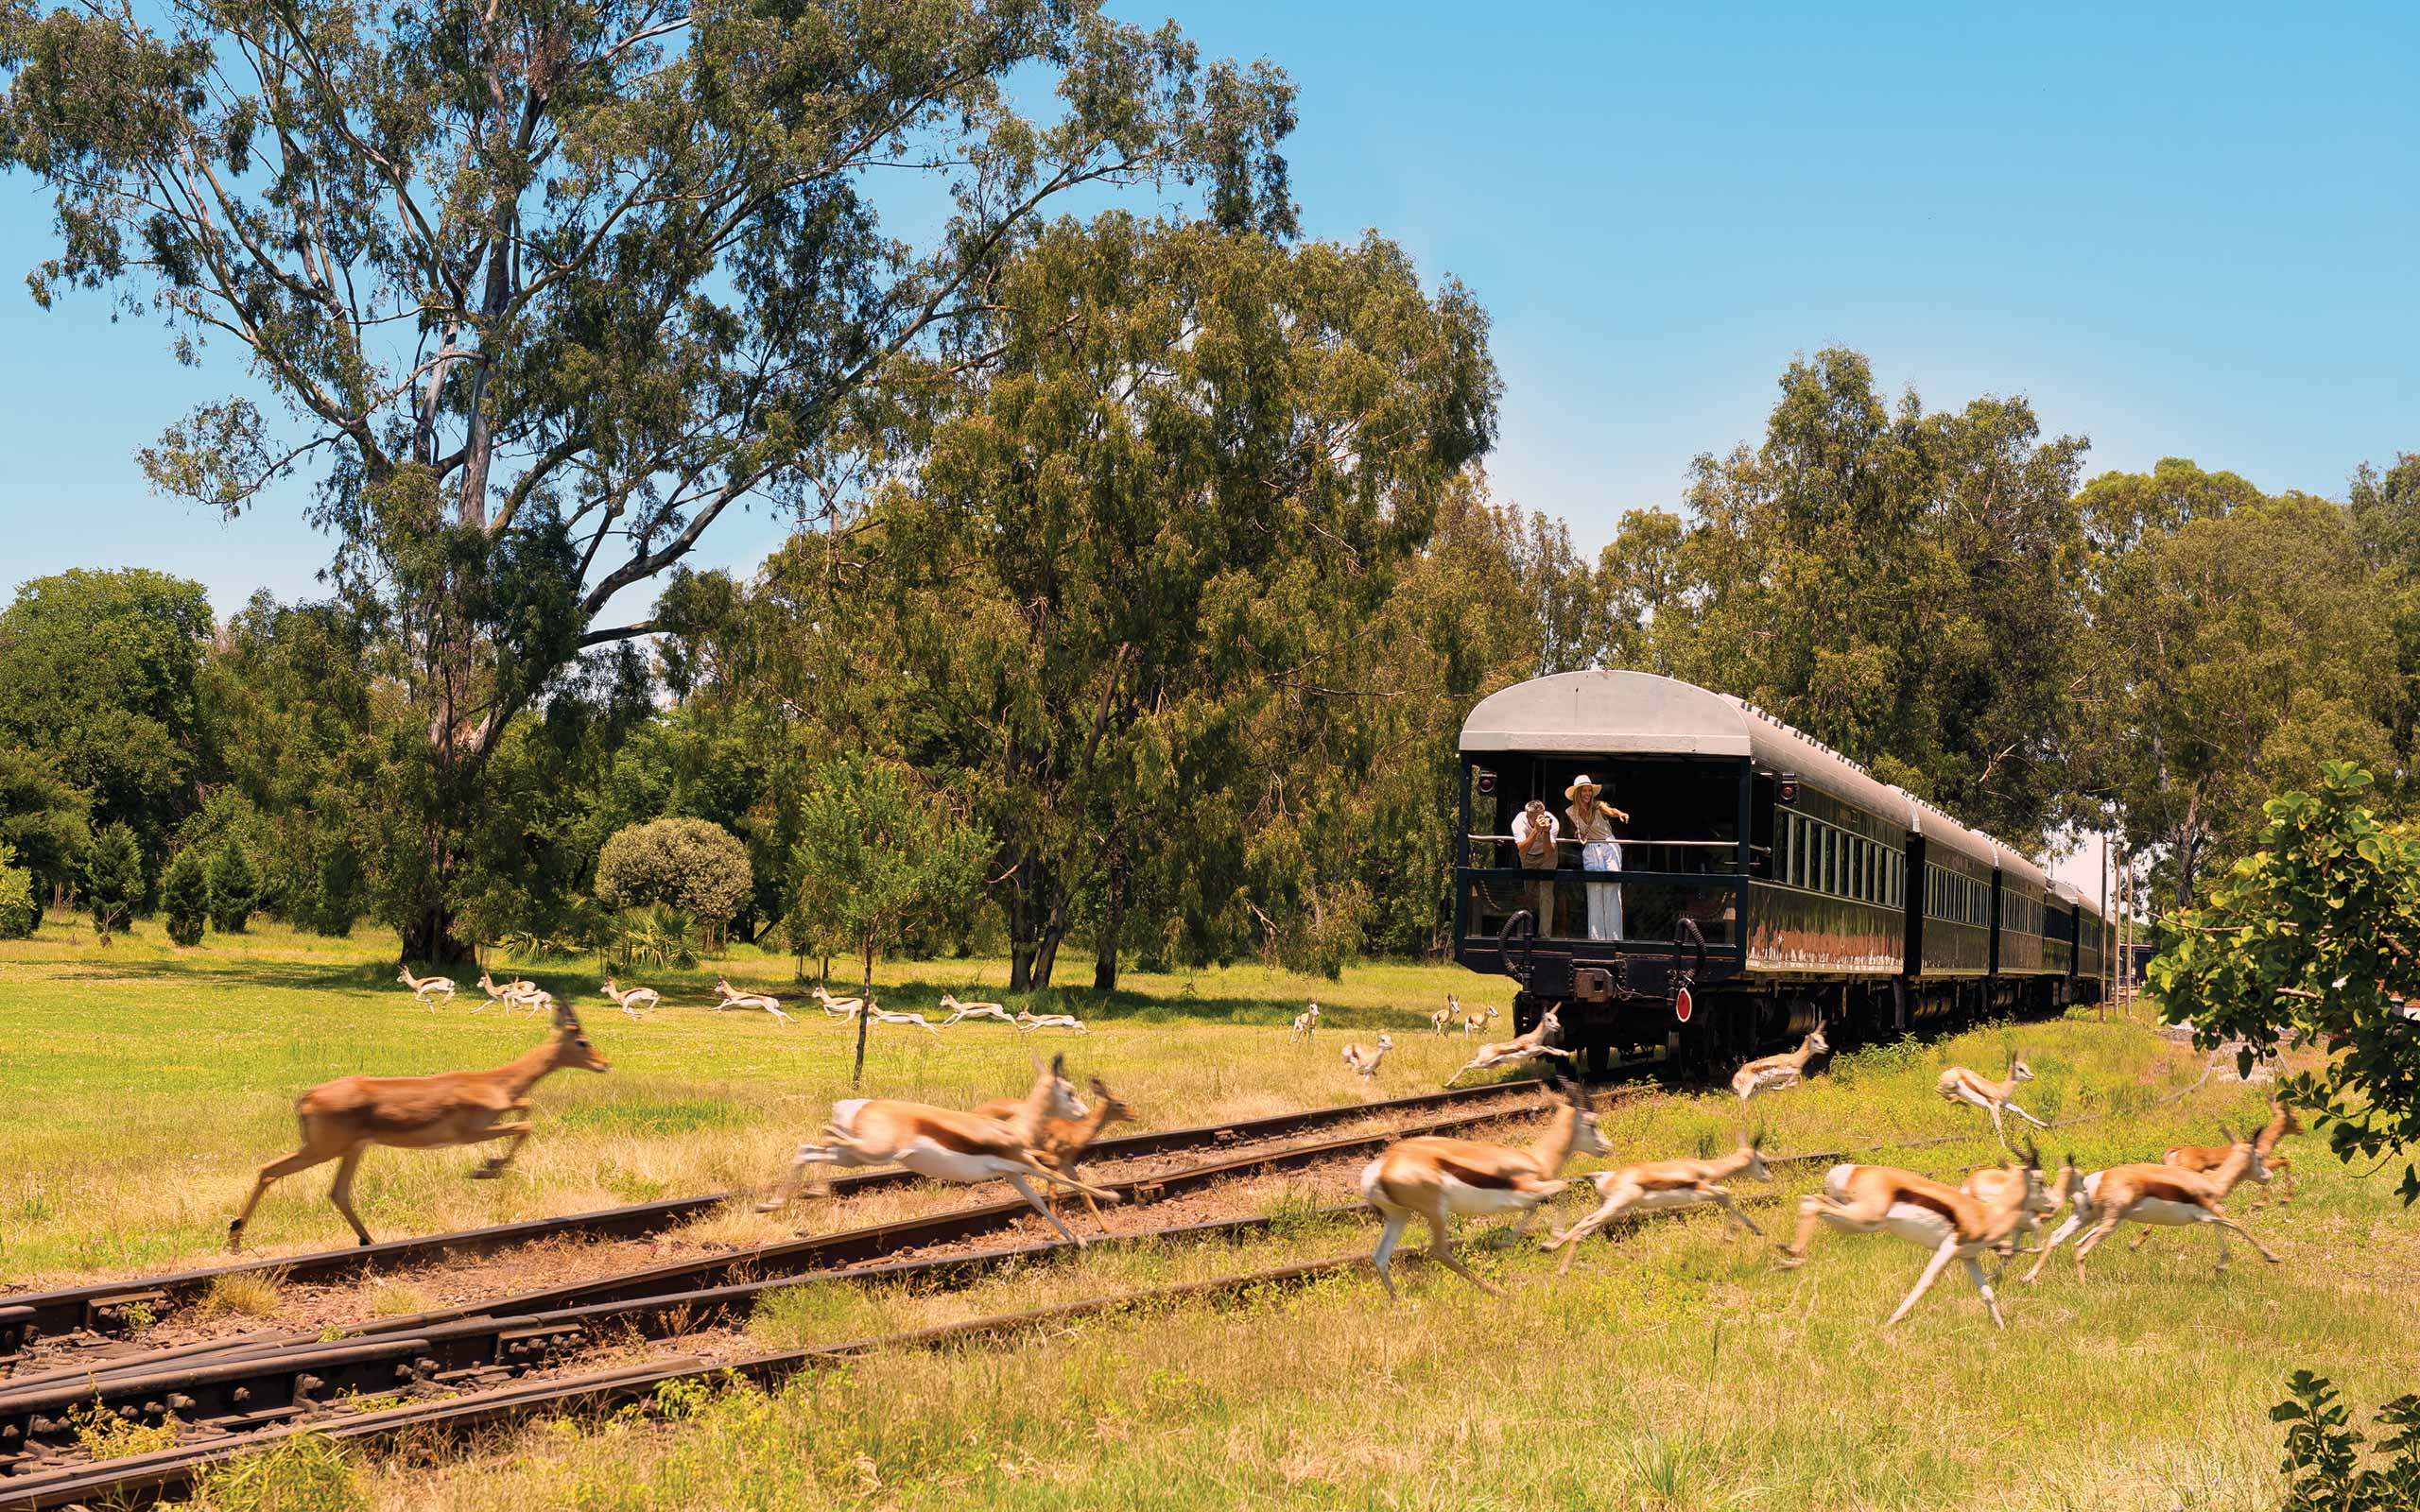 enkosi-africa-safari-rovos-rail-tren-train-observatory